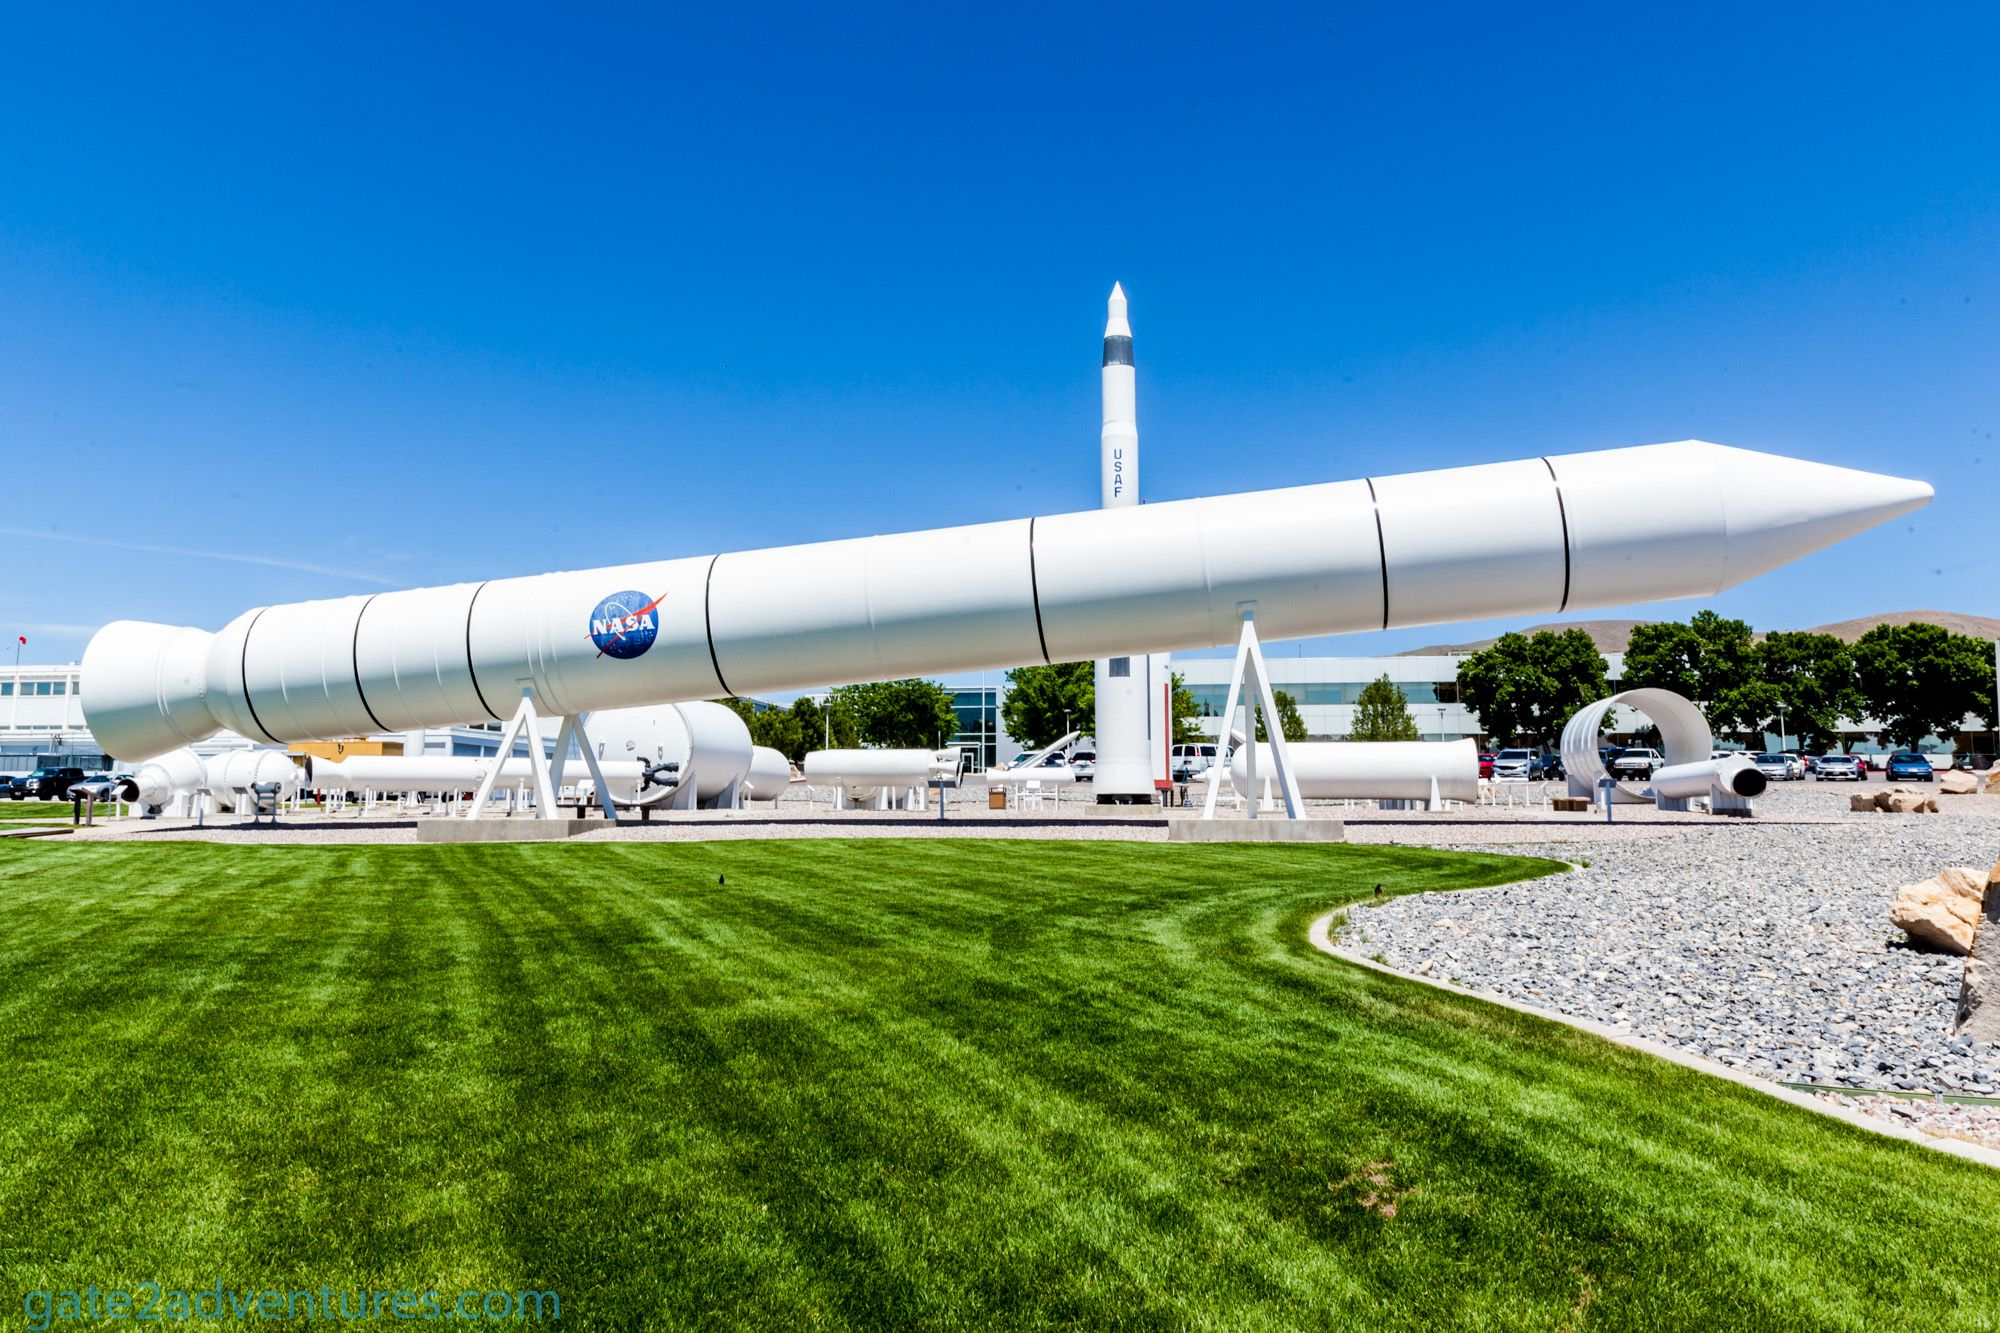 Orbital ATK Rocket Display